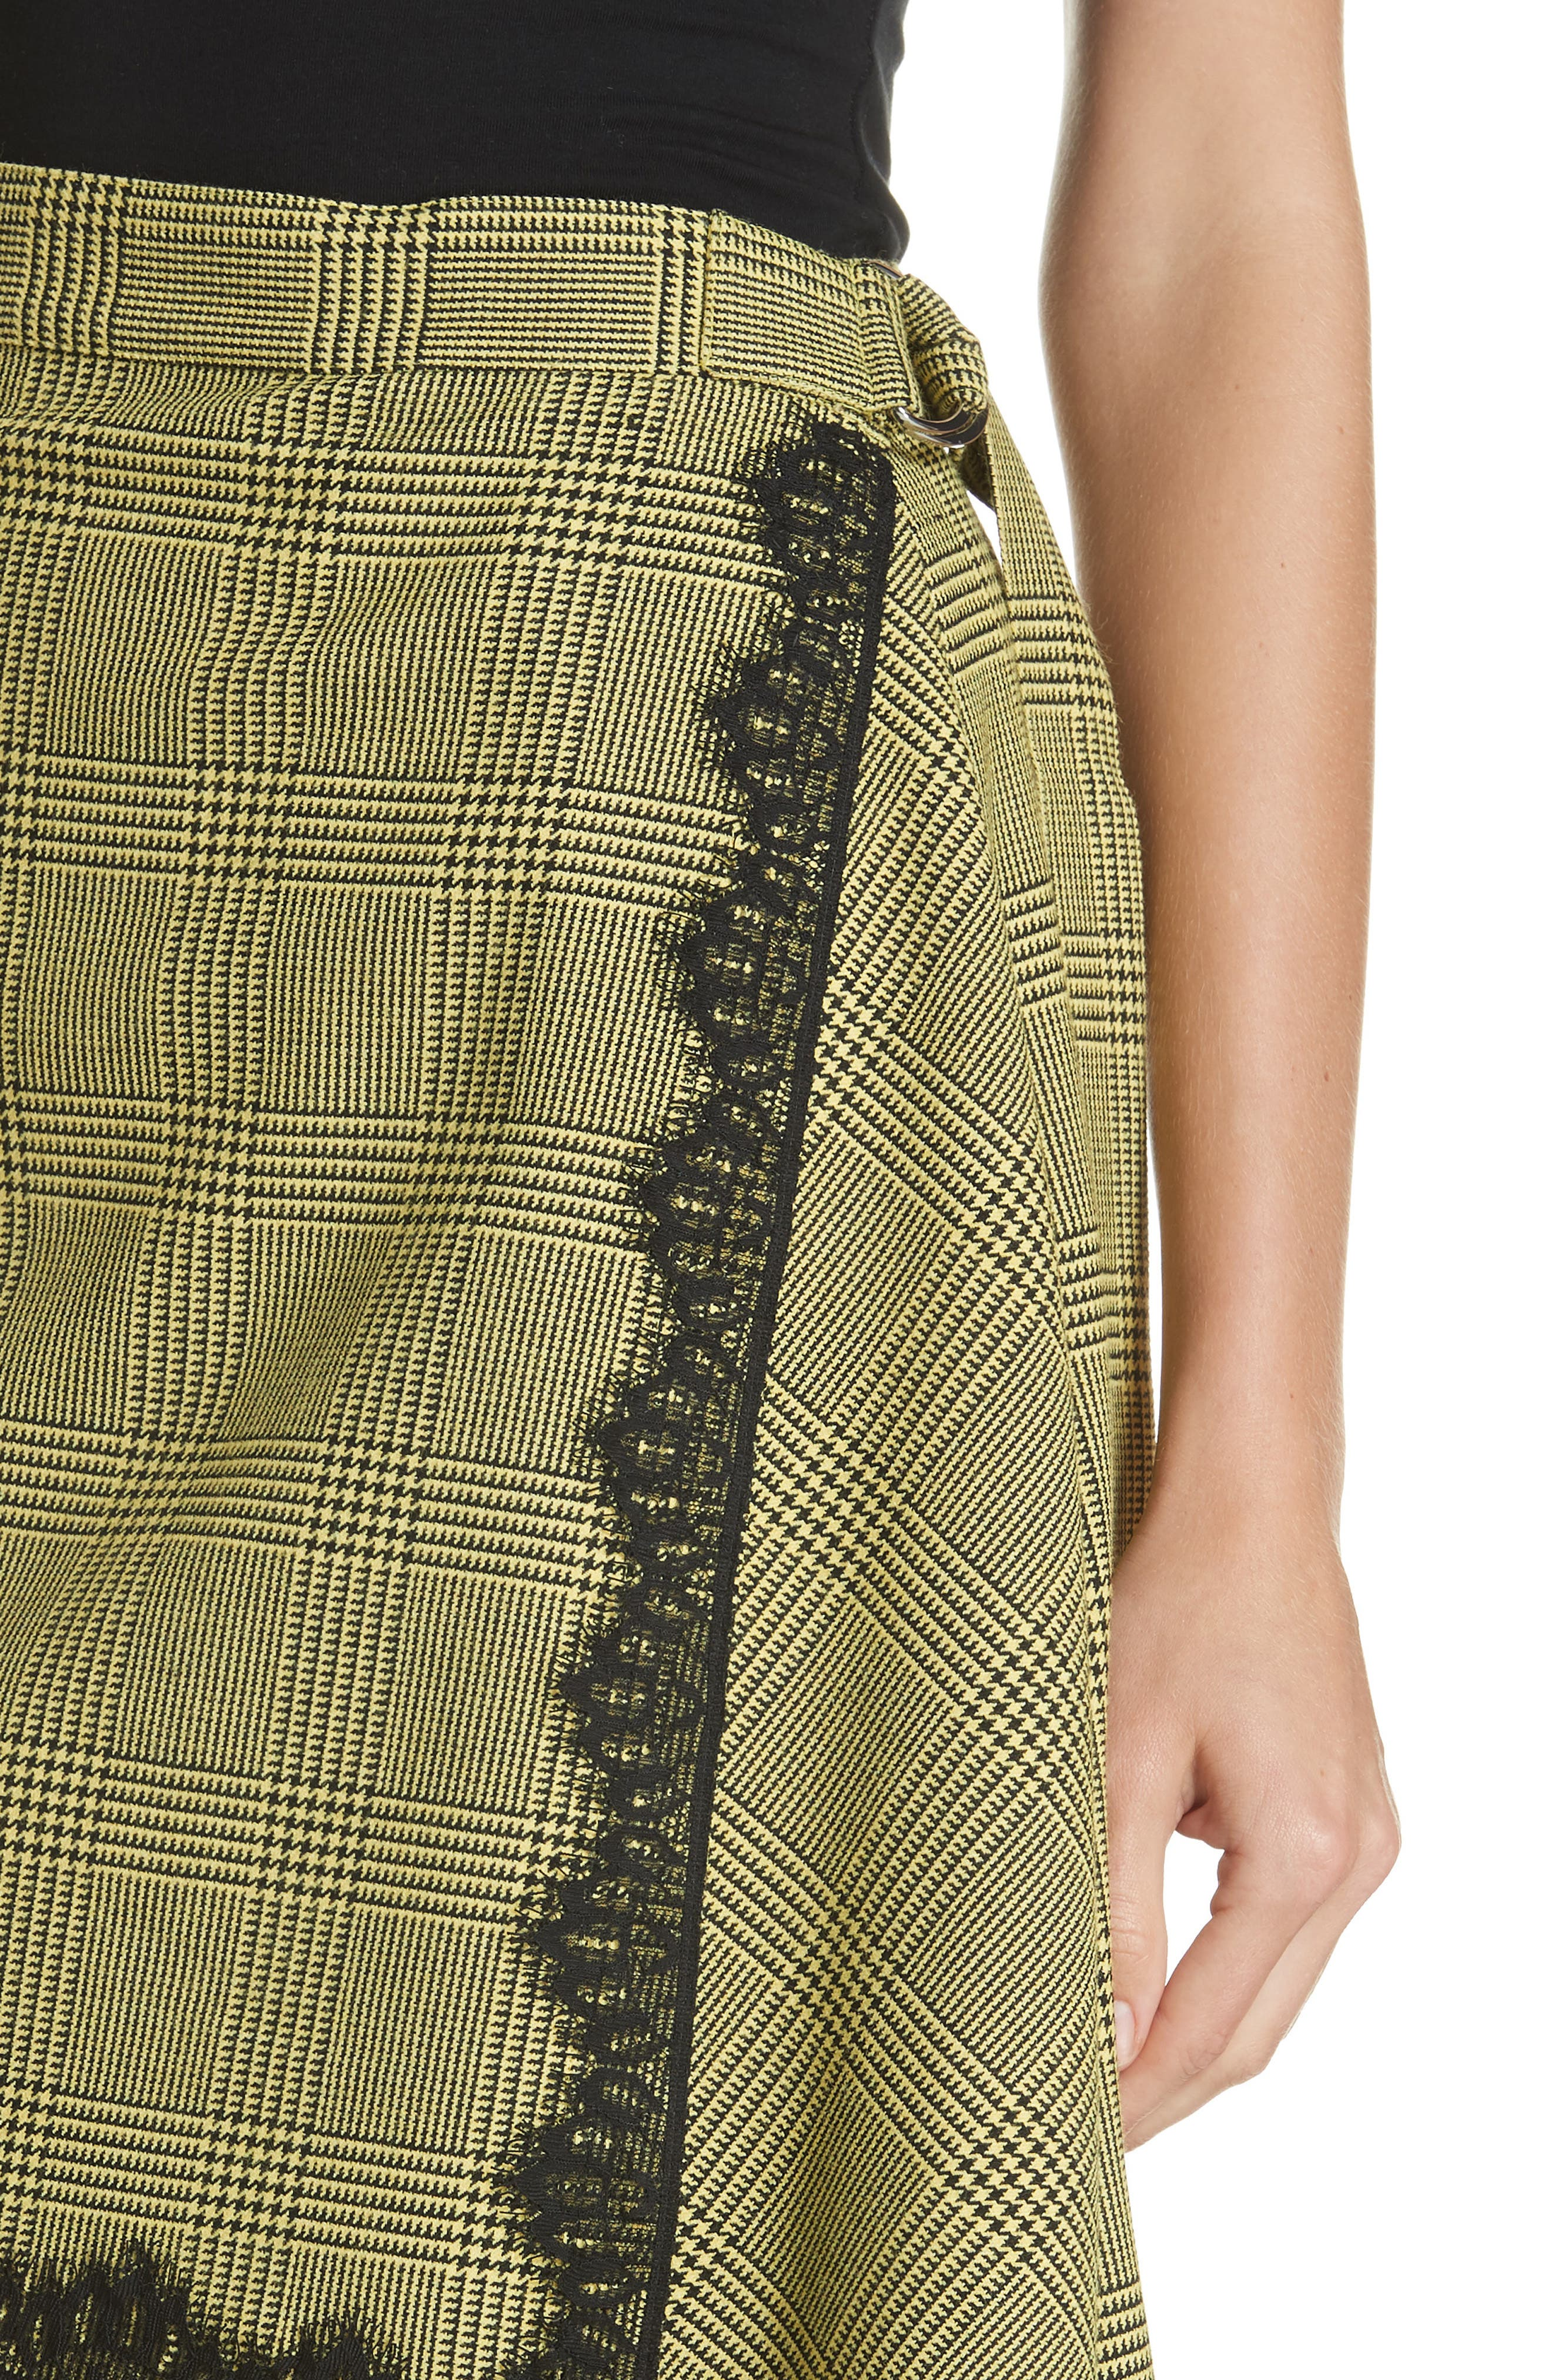 Lace Trim Plaid Skirt,                             Alternate thumbnail 4, color,                             BLACK/ YELLOW